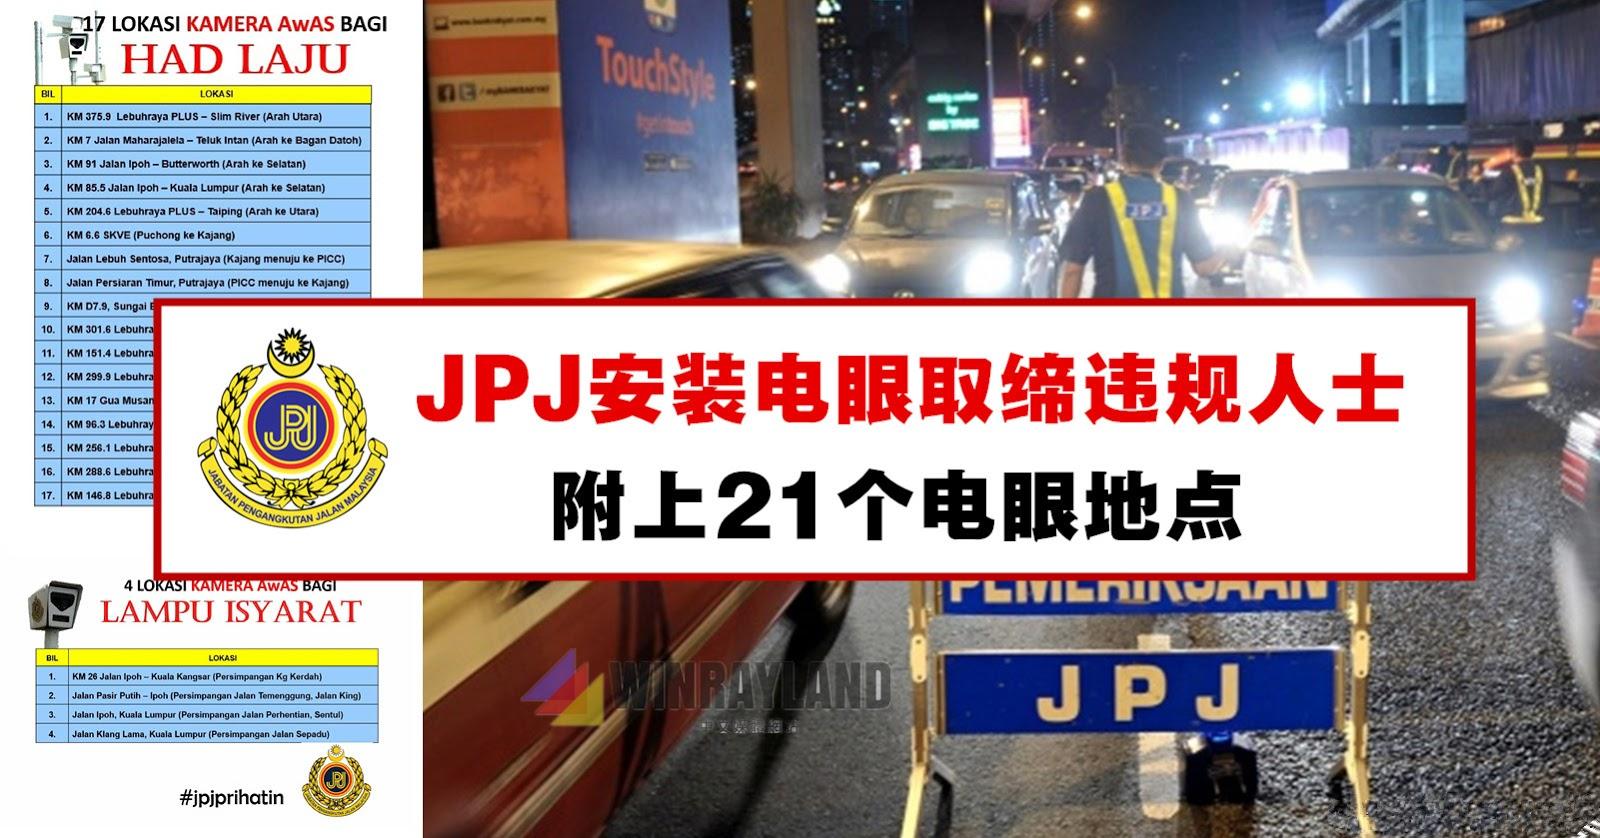 JPJ安装电眼取缔违规人士,附上21个电眼地点